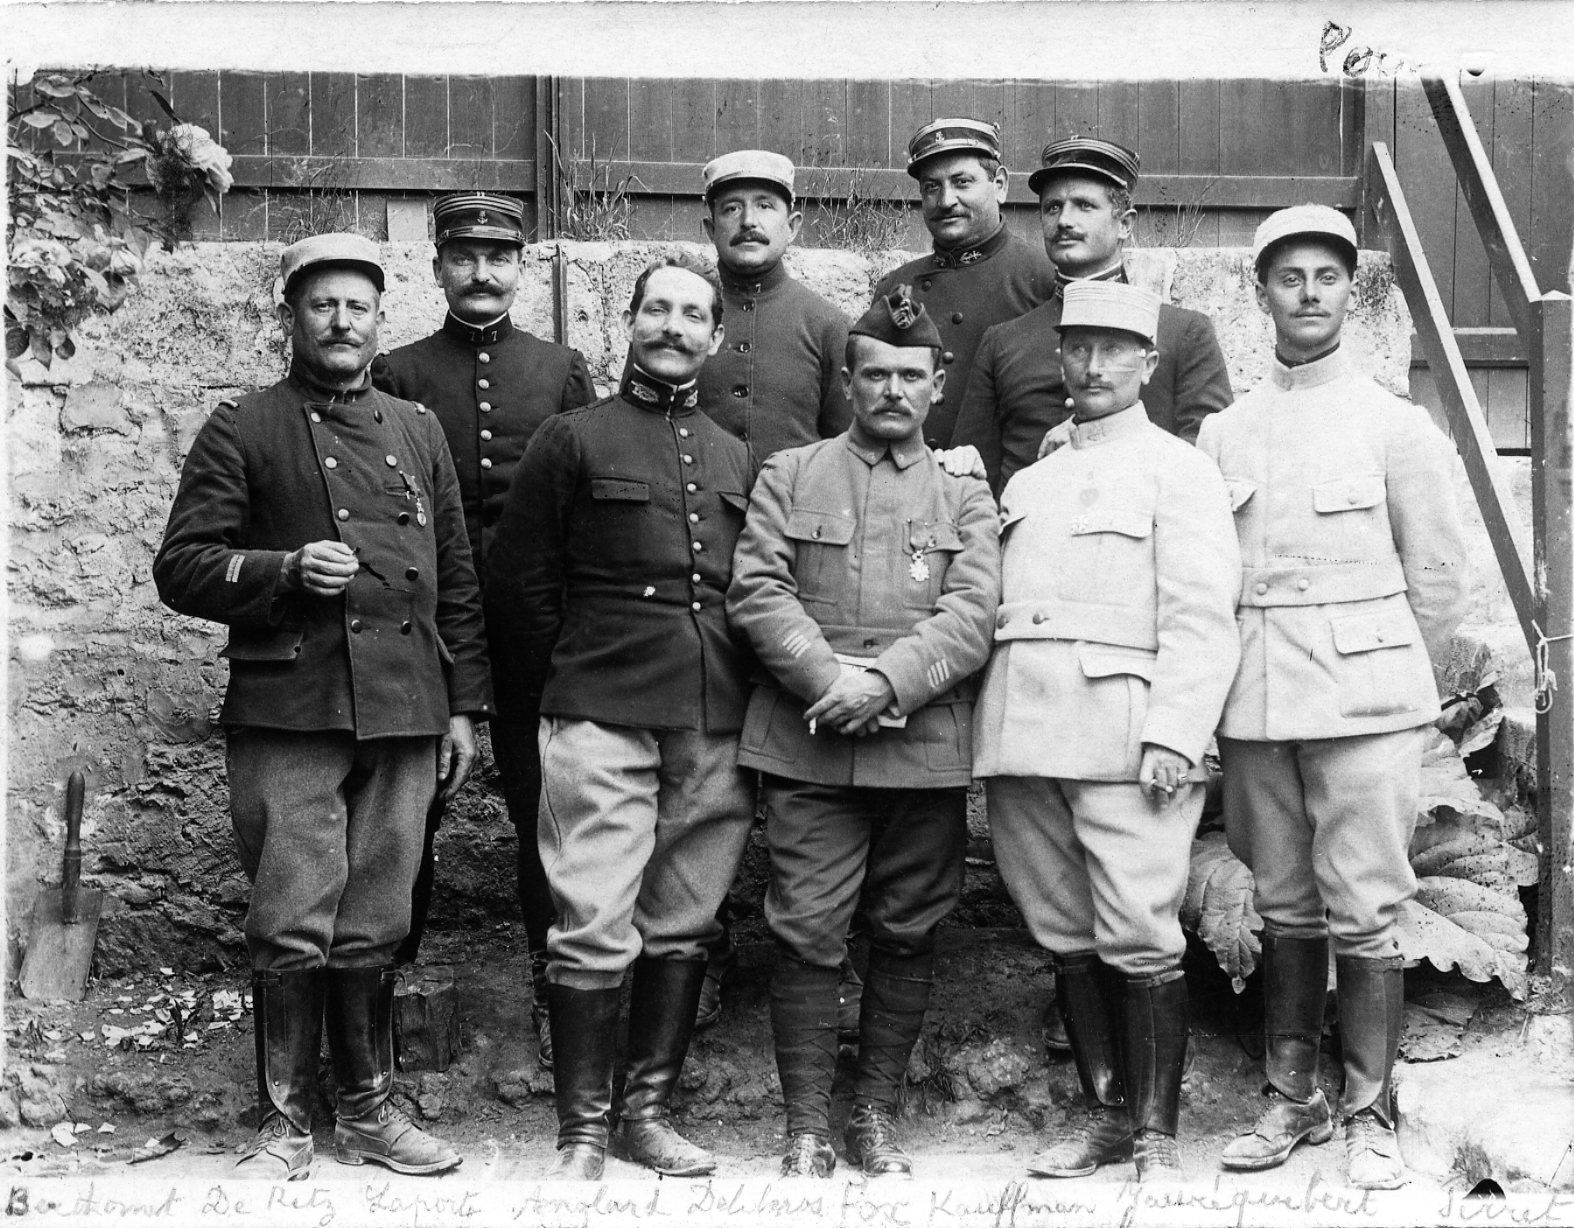 Juin 1915 - Les Perret en campagne - Collection Ph. Gauvain